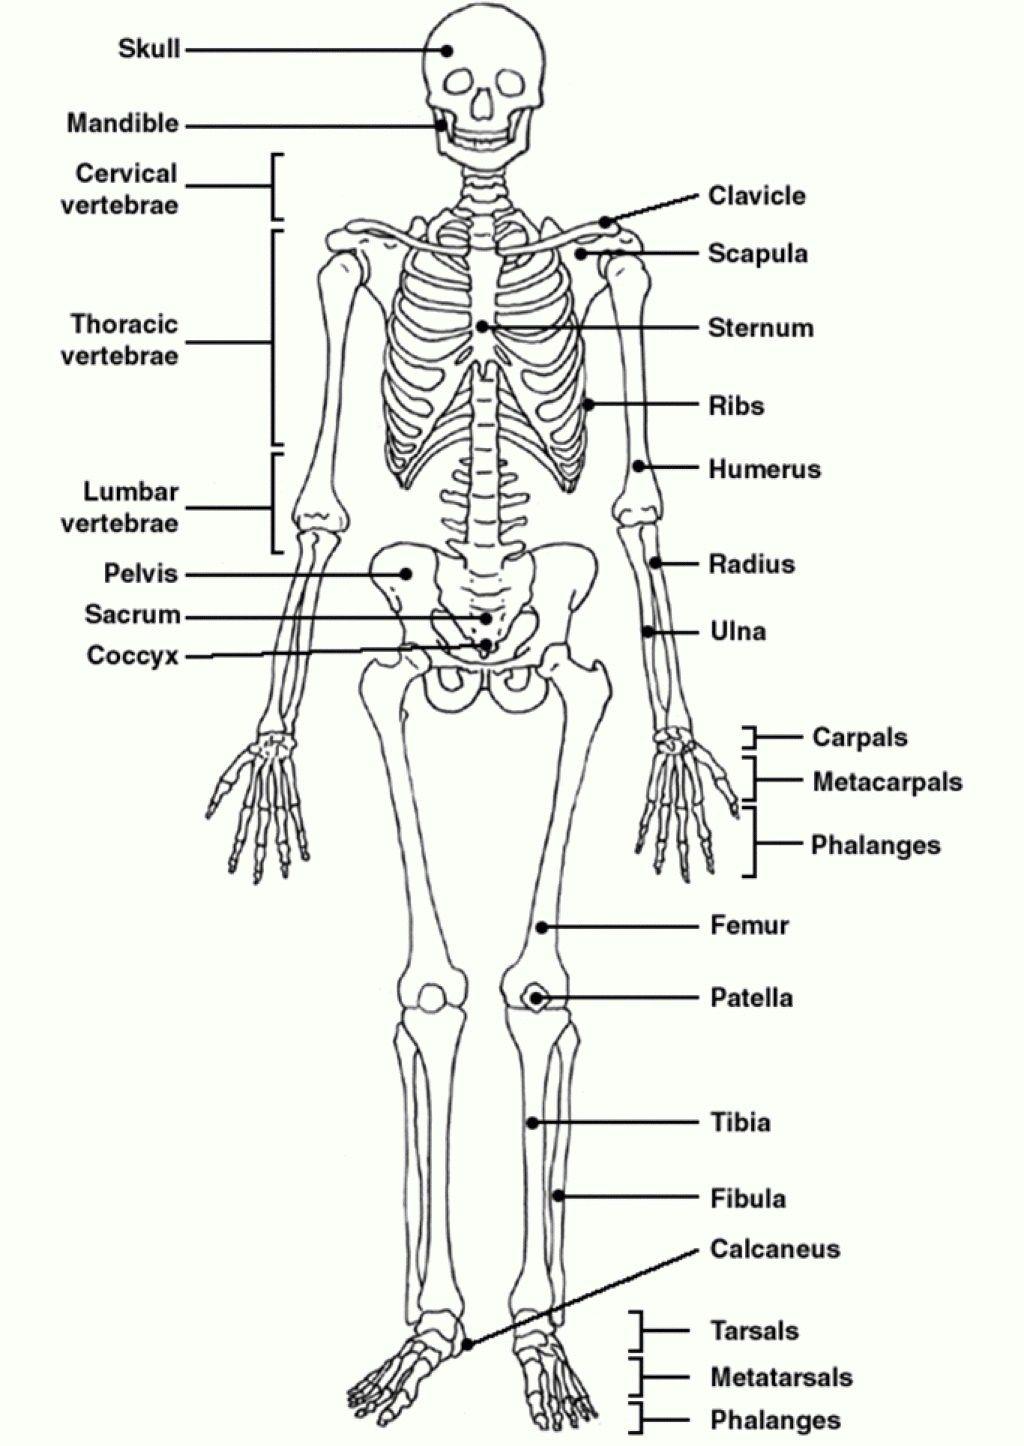 Human Skeleton Diagram With Labels Koibana Info Human Skeletal System Skeletal System Worksheet Skeletal System Anatomy